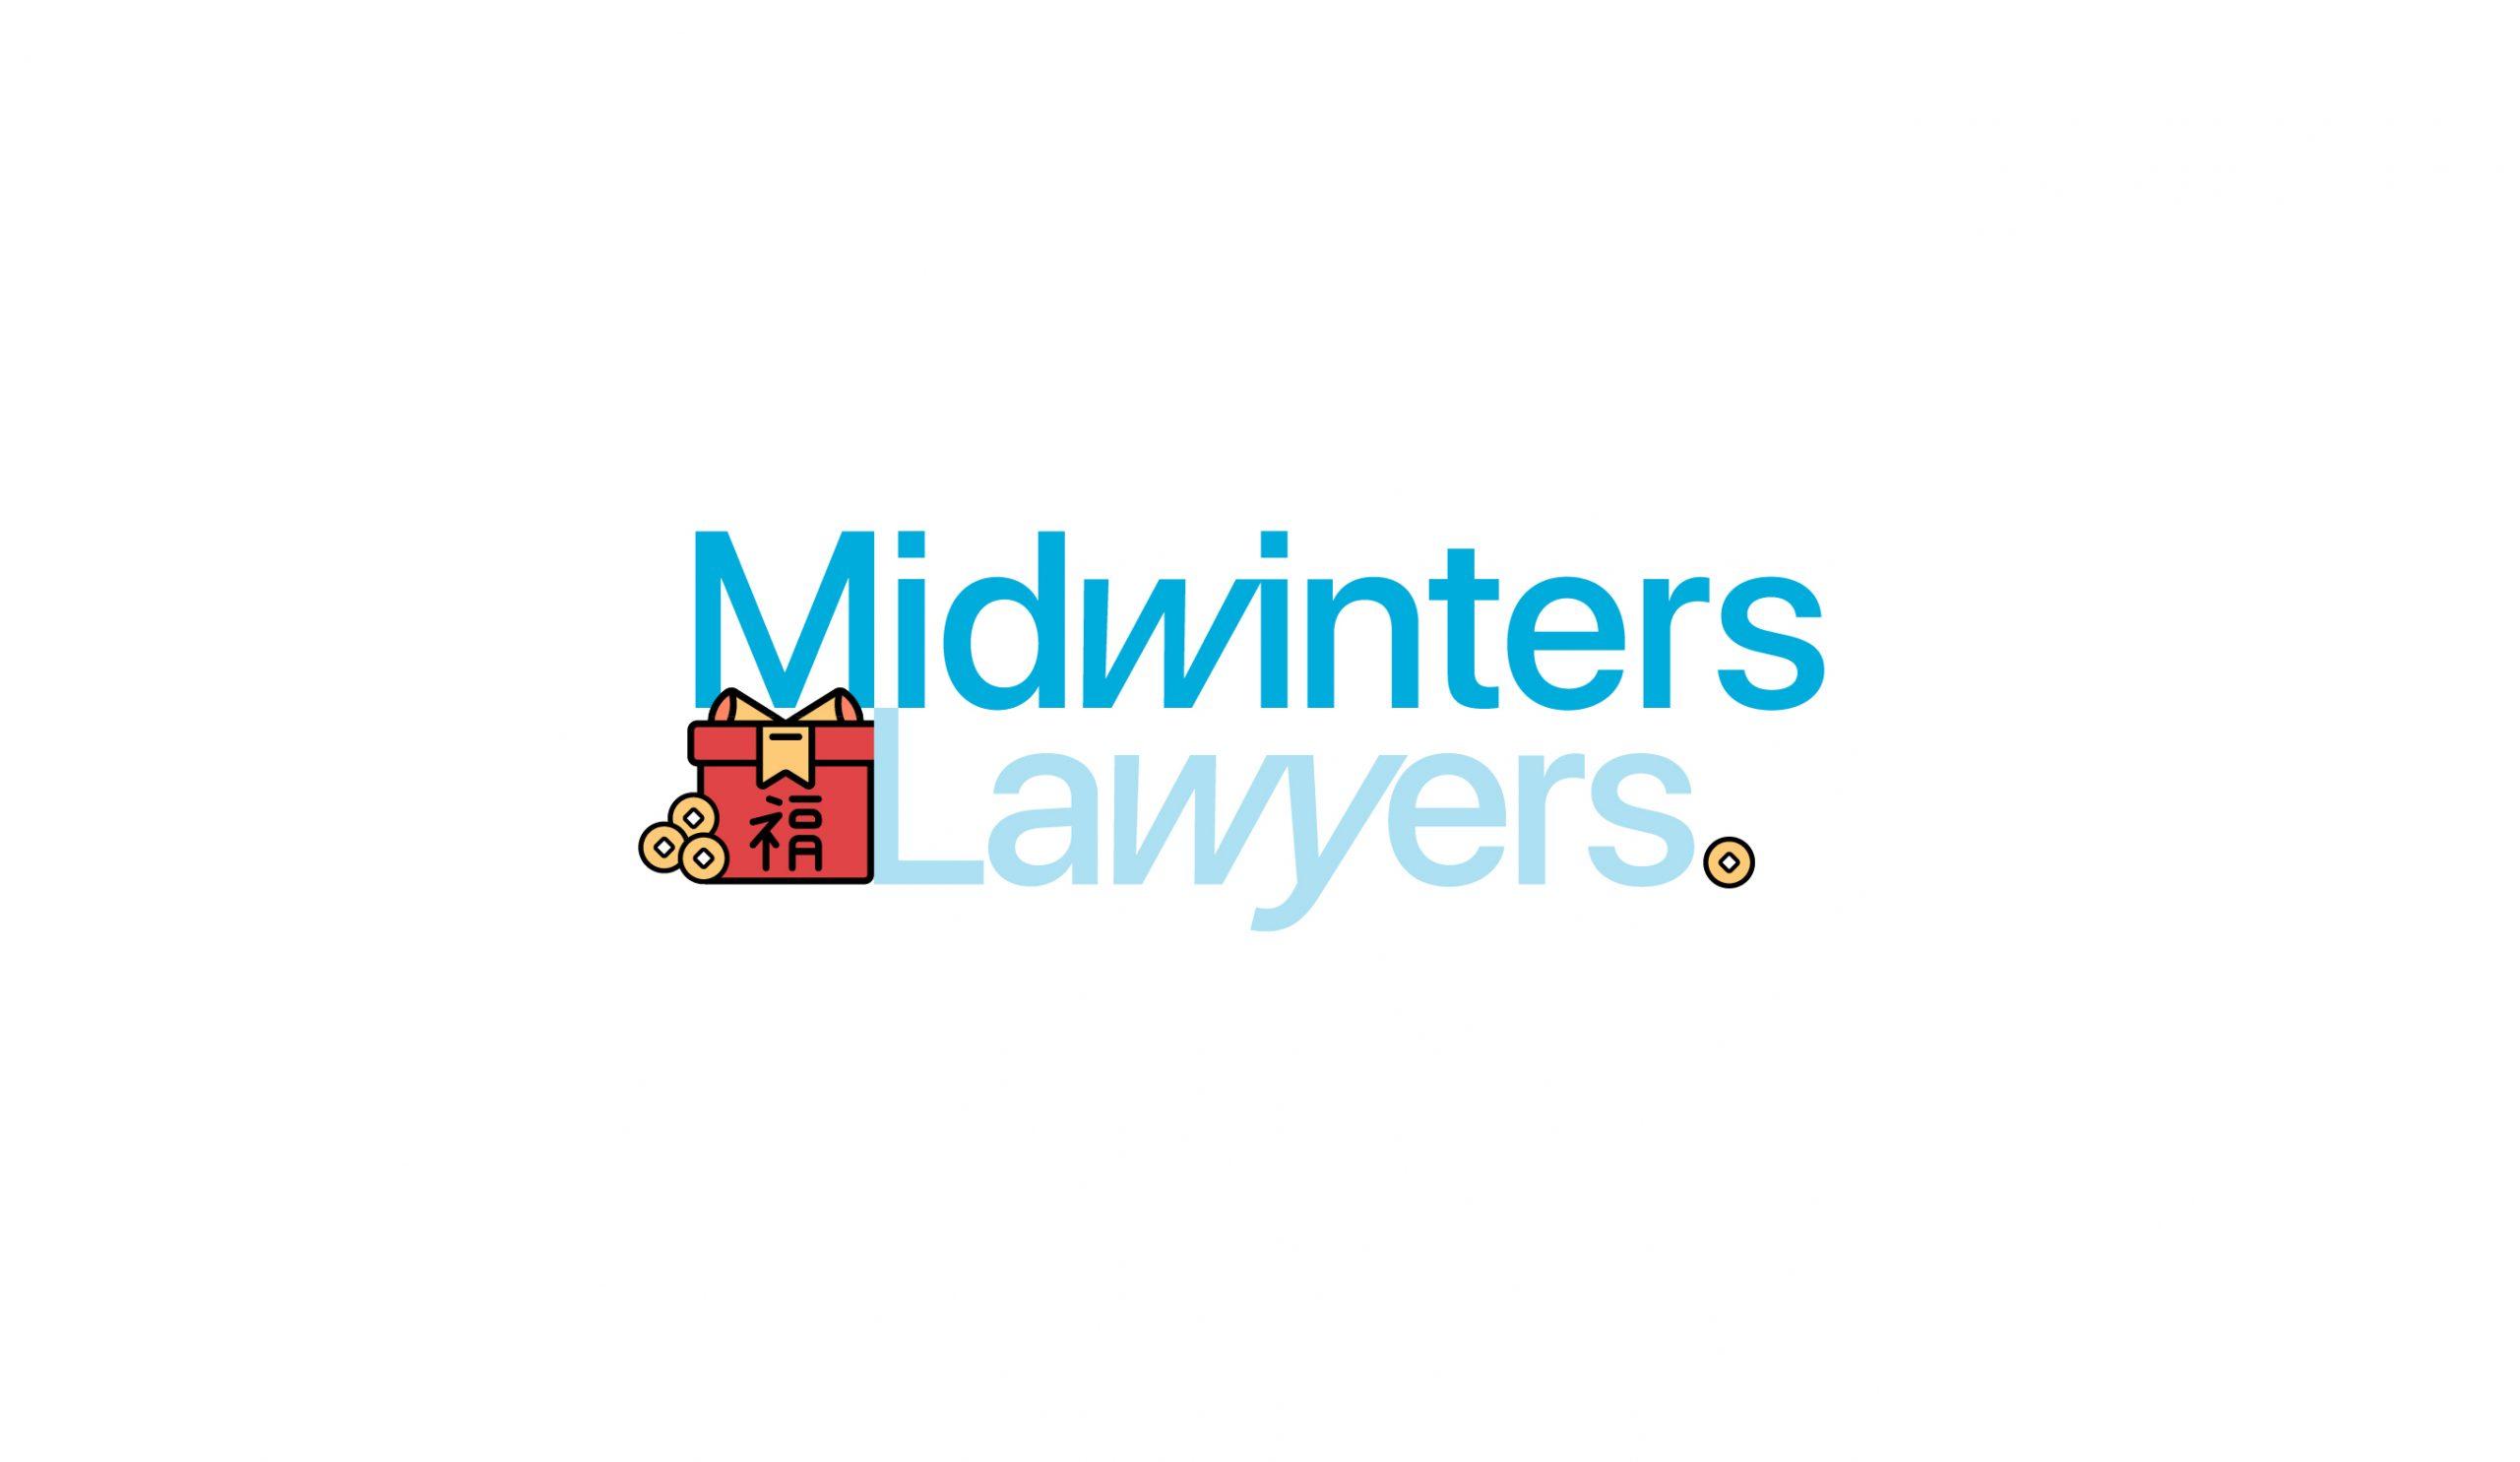 Midwinters | Lawyers